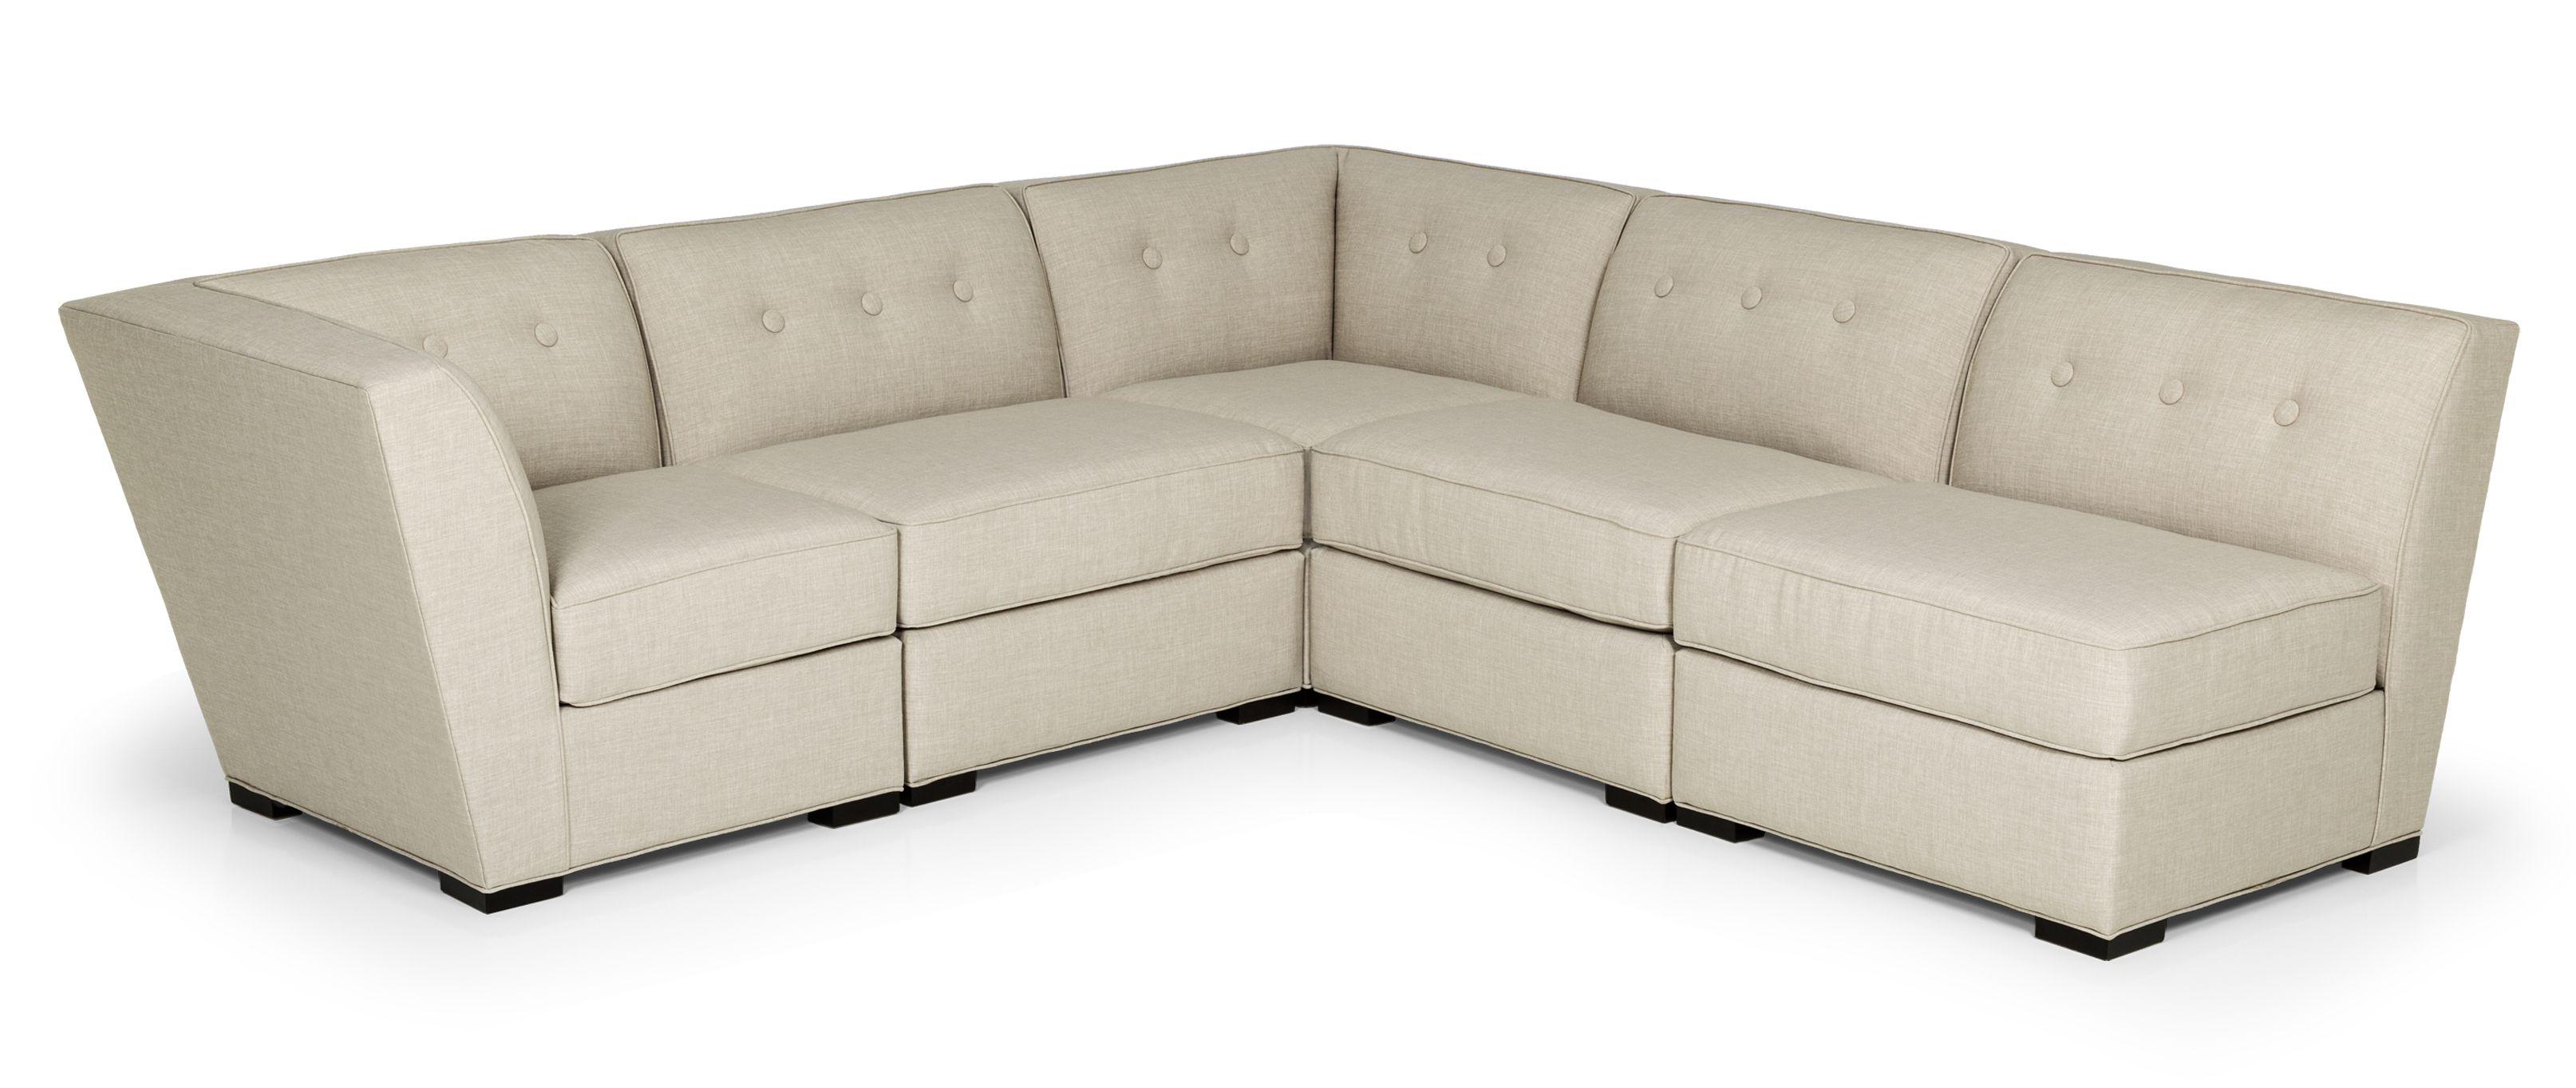 Astonishing Welcome To Stanton Sofas Brenners Furniture Sofa Download Free Architecture Designs Fluibritishbridgeorg